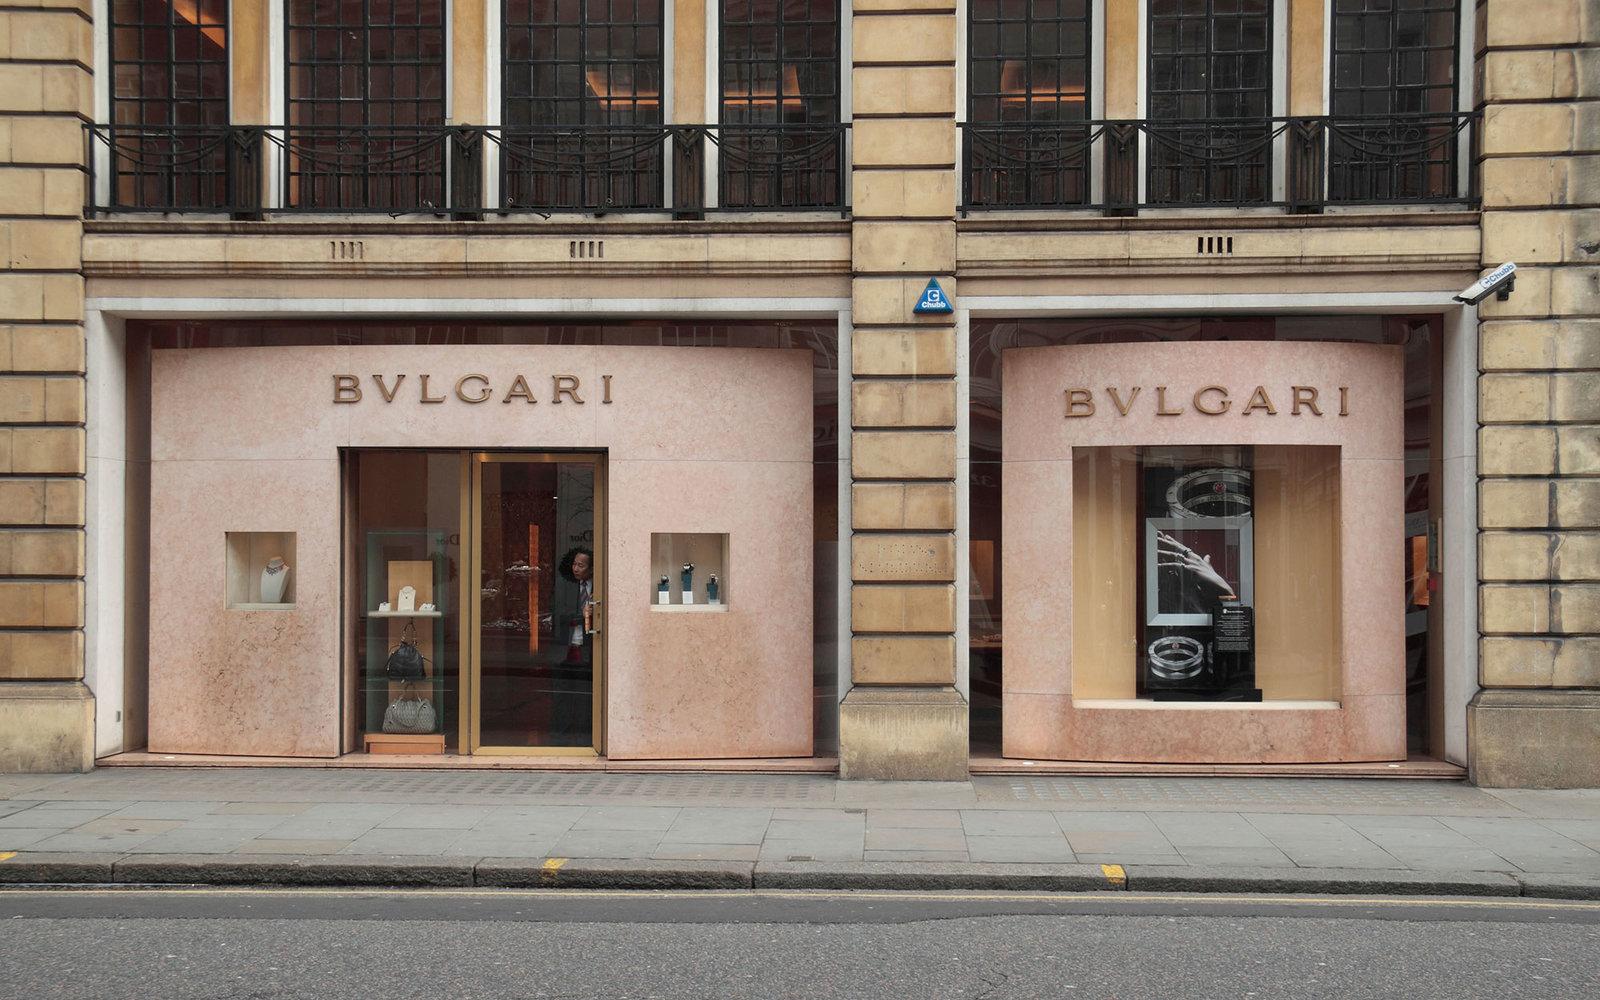 The Bulgari jewellry store on Sloane Street, London, SW1, England.